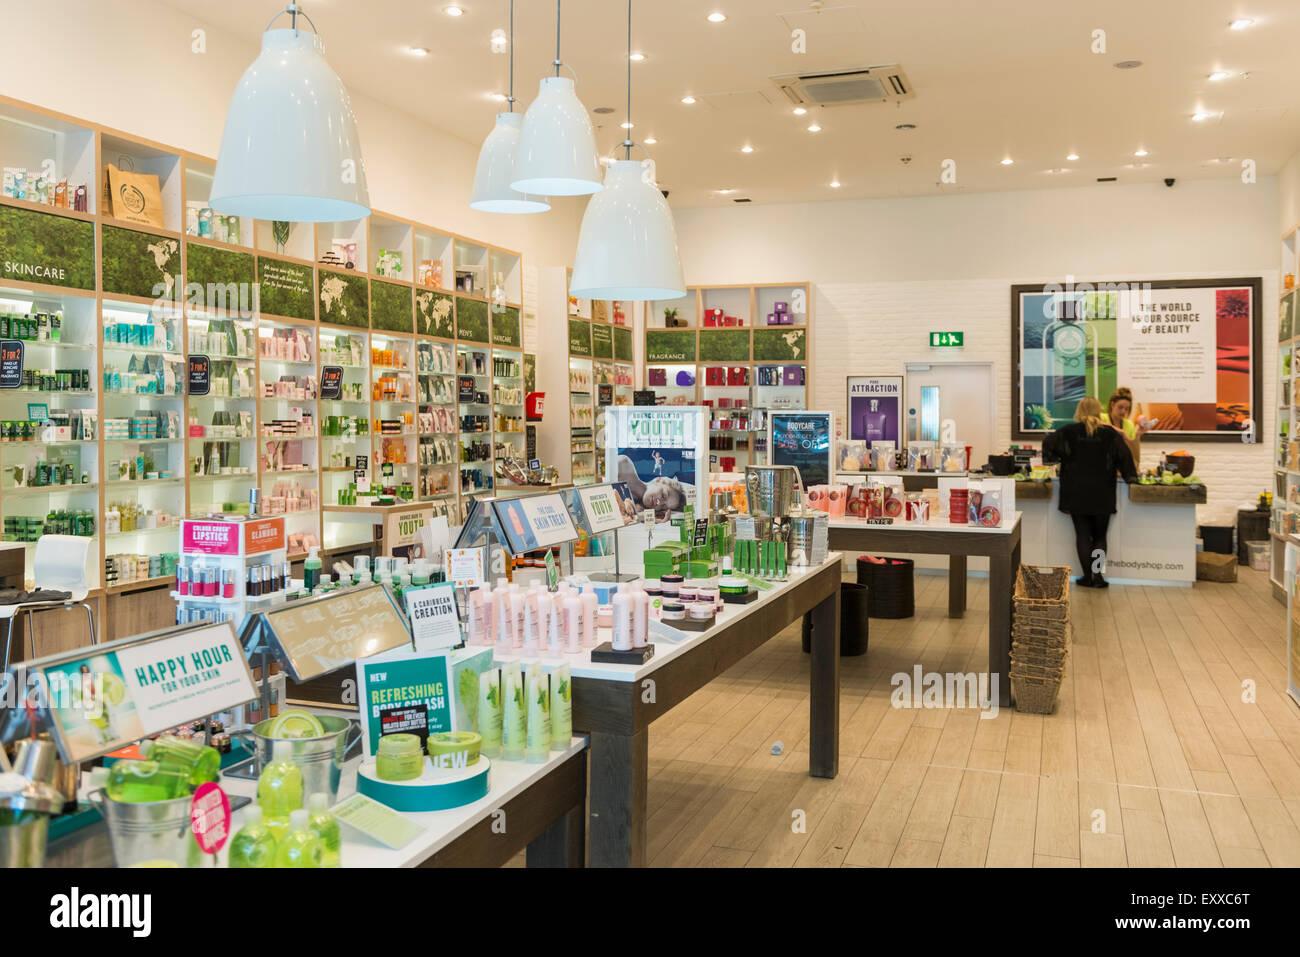 Inside The Body Shop Retail Store Uk Stock Photo Royalty Free Image 85402880 Alamy